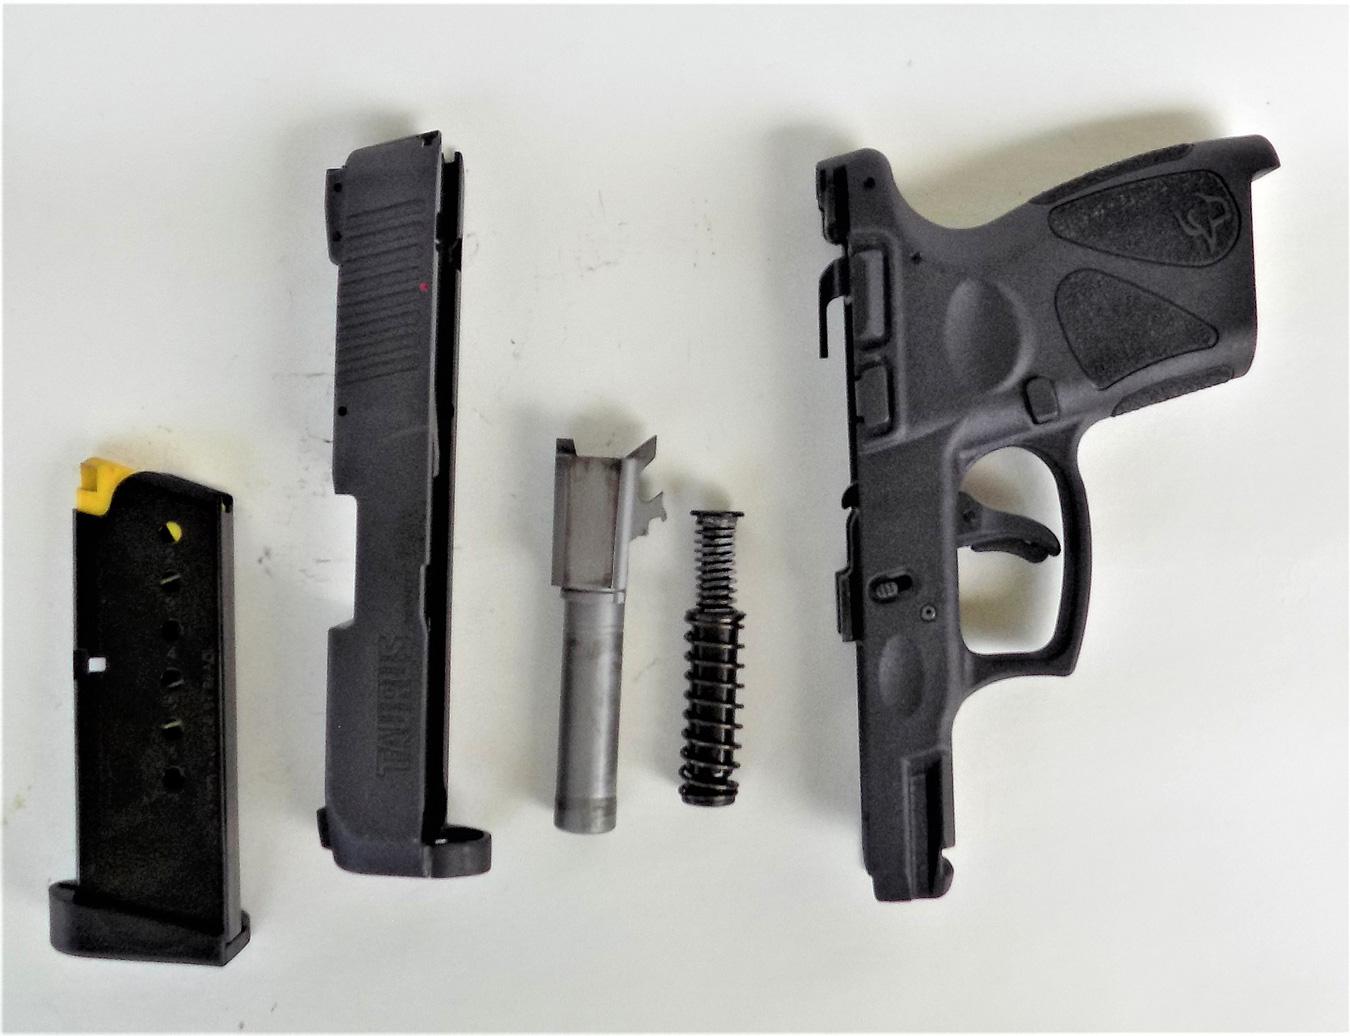 Field stripped Taurus Millennium pistol